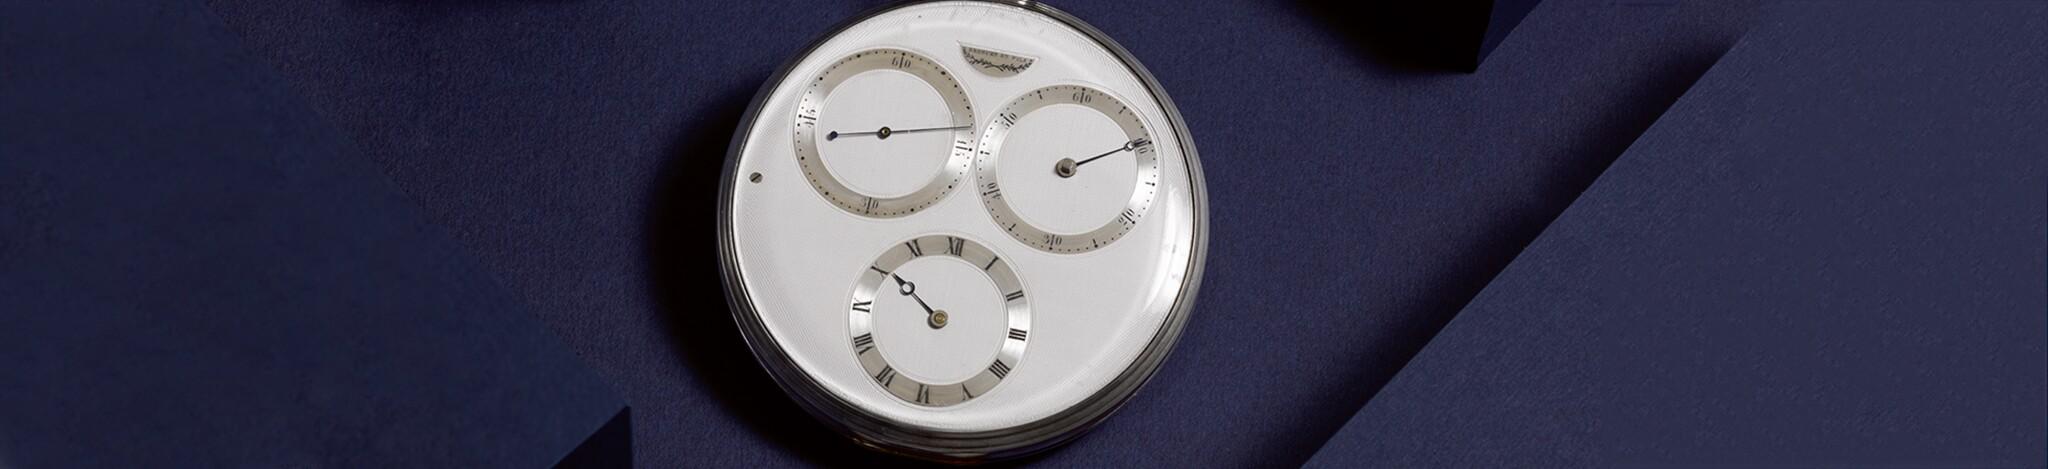 Masterworks of Time: Abraham Louis Breguet, Horologist Extraordinaire 「時間傑作——阿伯拉罕・路易・寶璣:鐘錶鬼才」